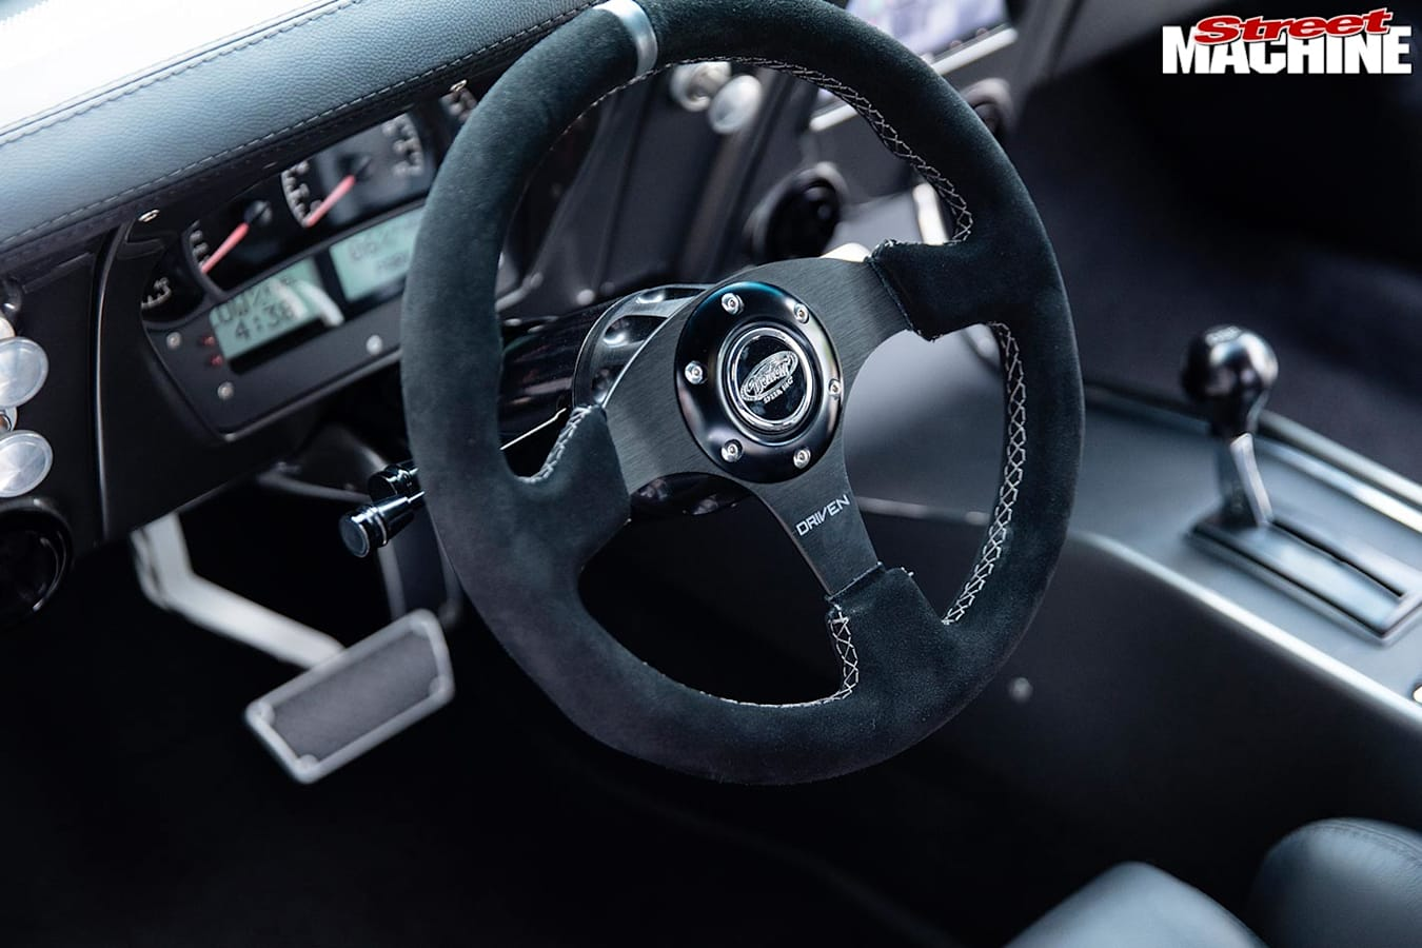 Chev Camaro steering wheel